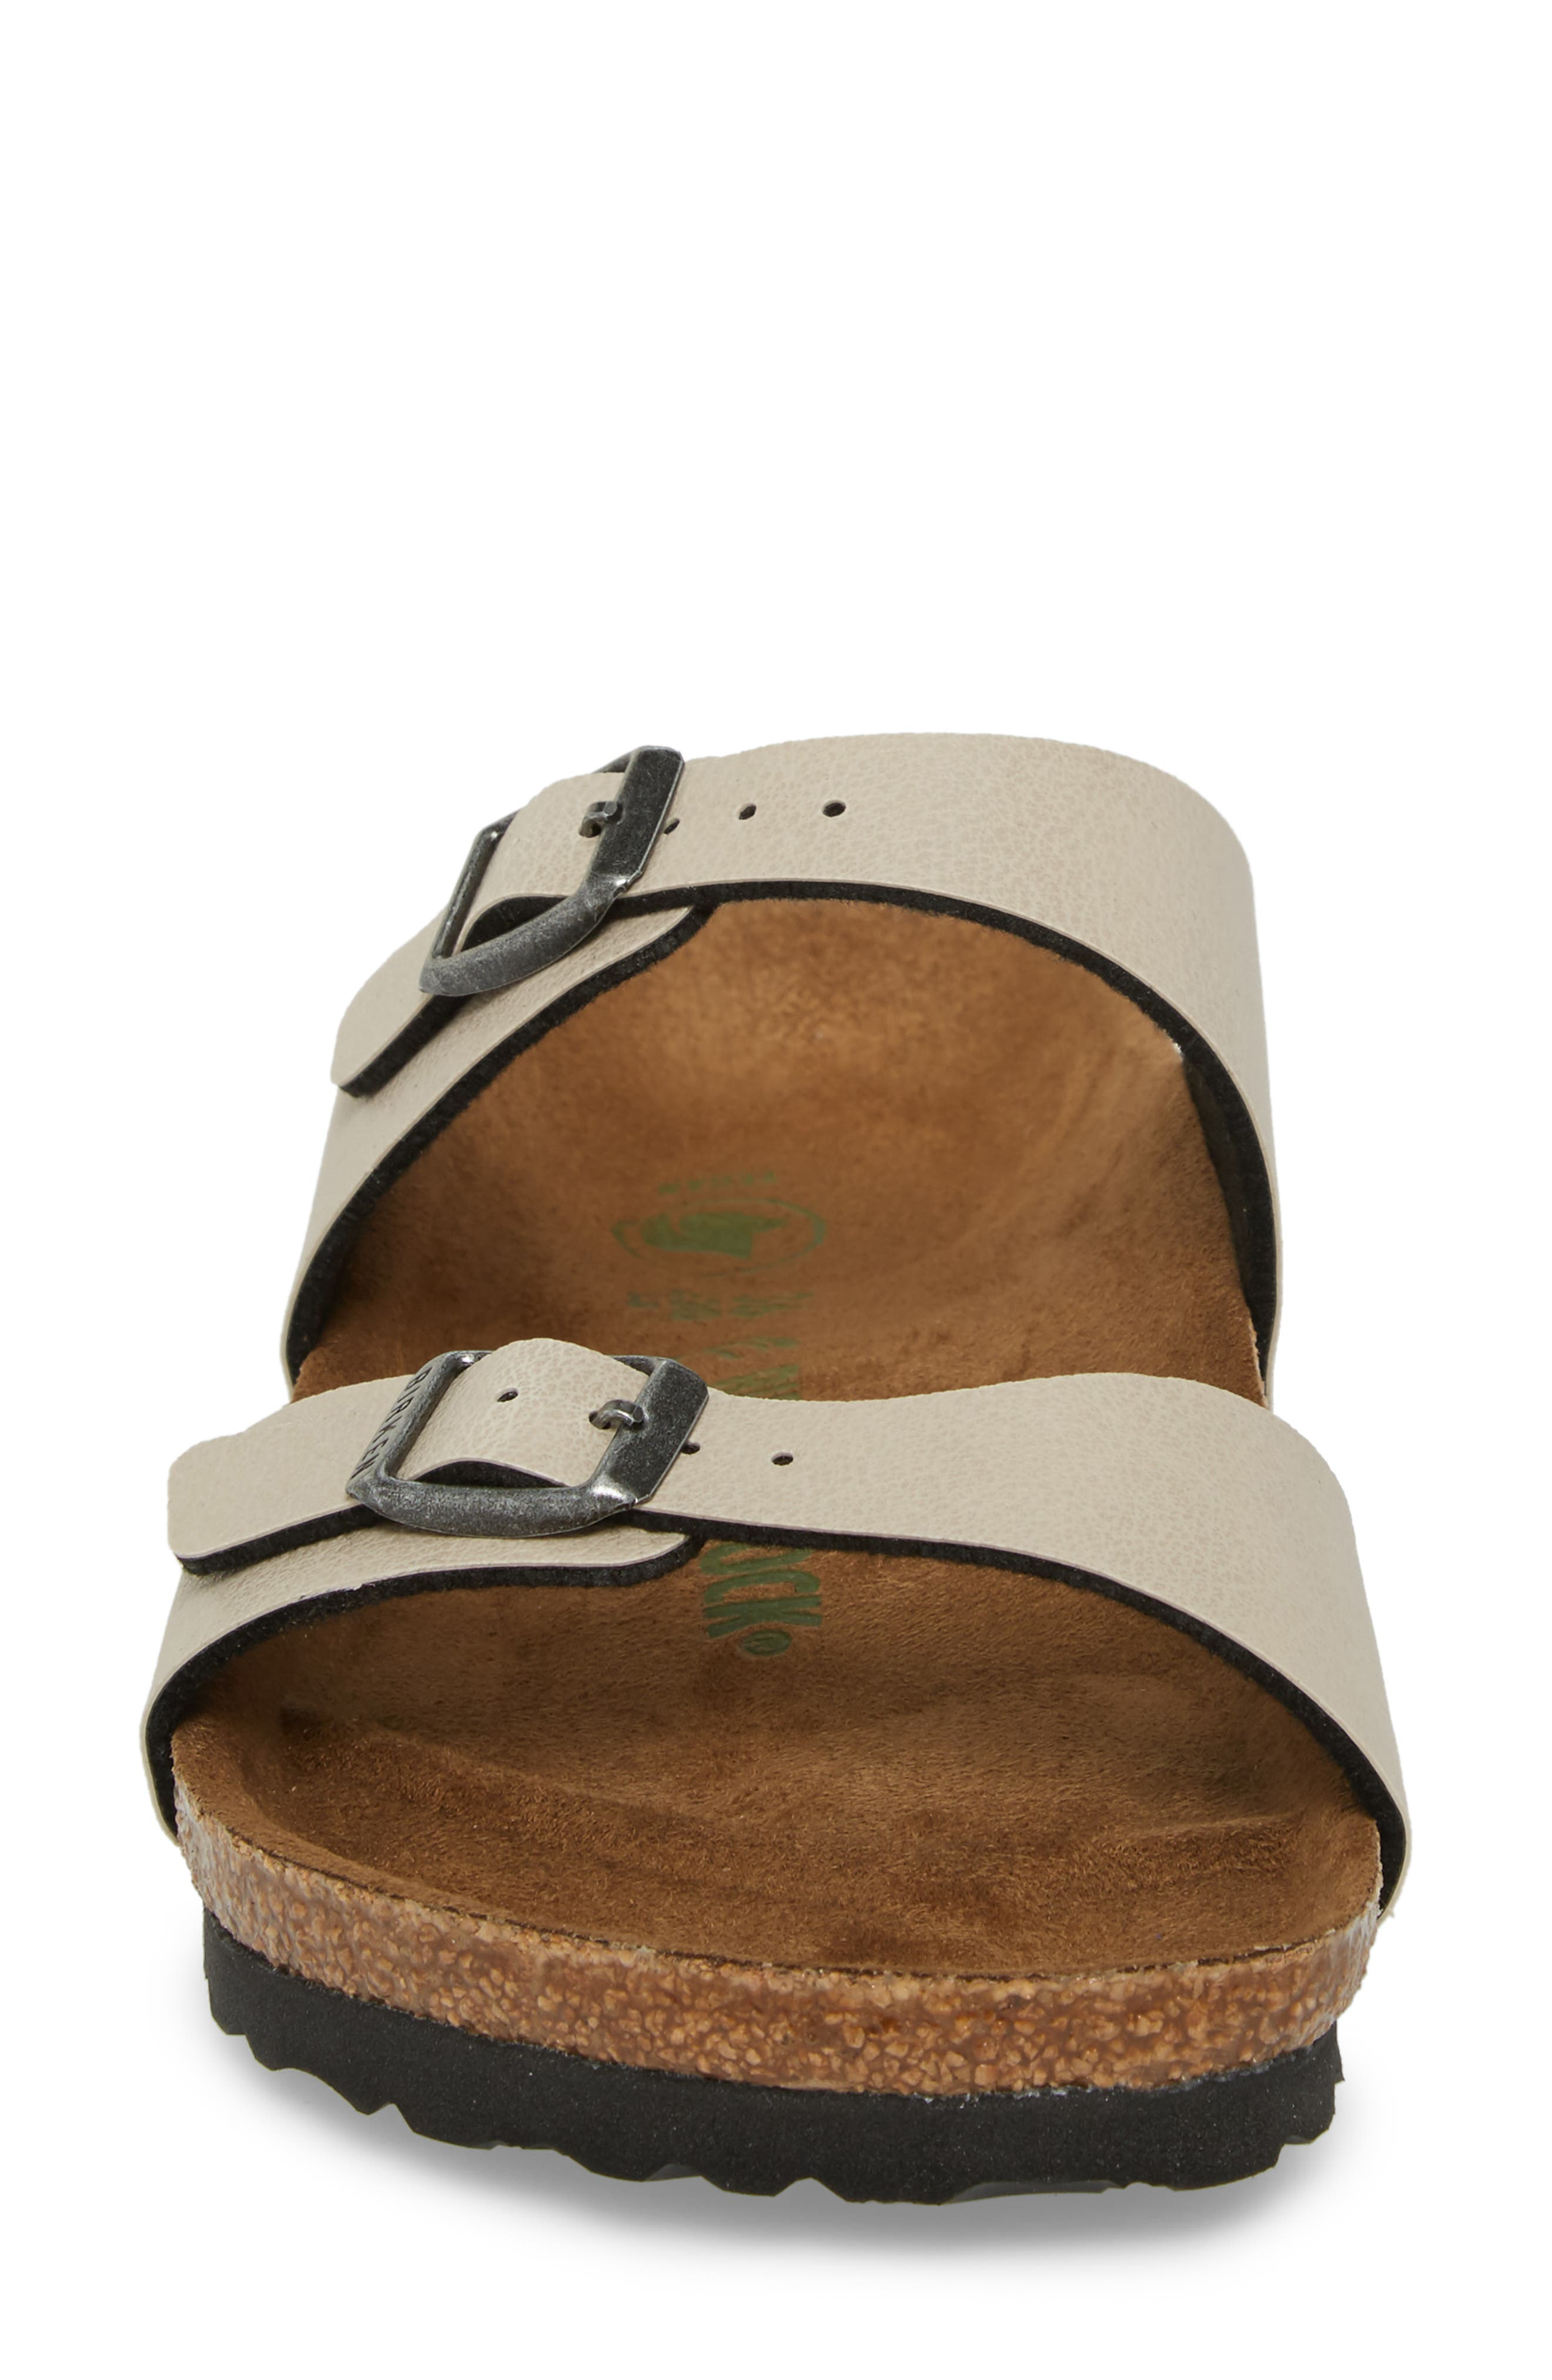 'Sydney' Sandal,                             Alternate thumbnail 4, color,                             Stone Leather